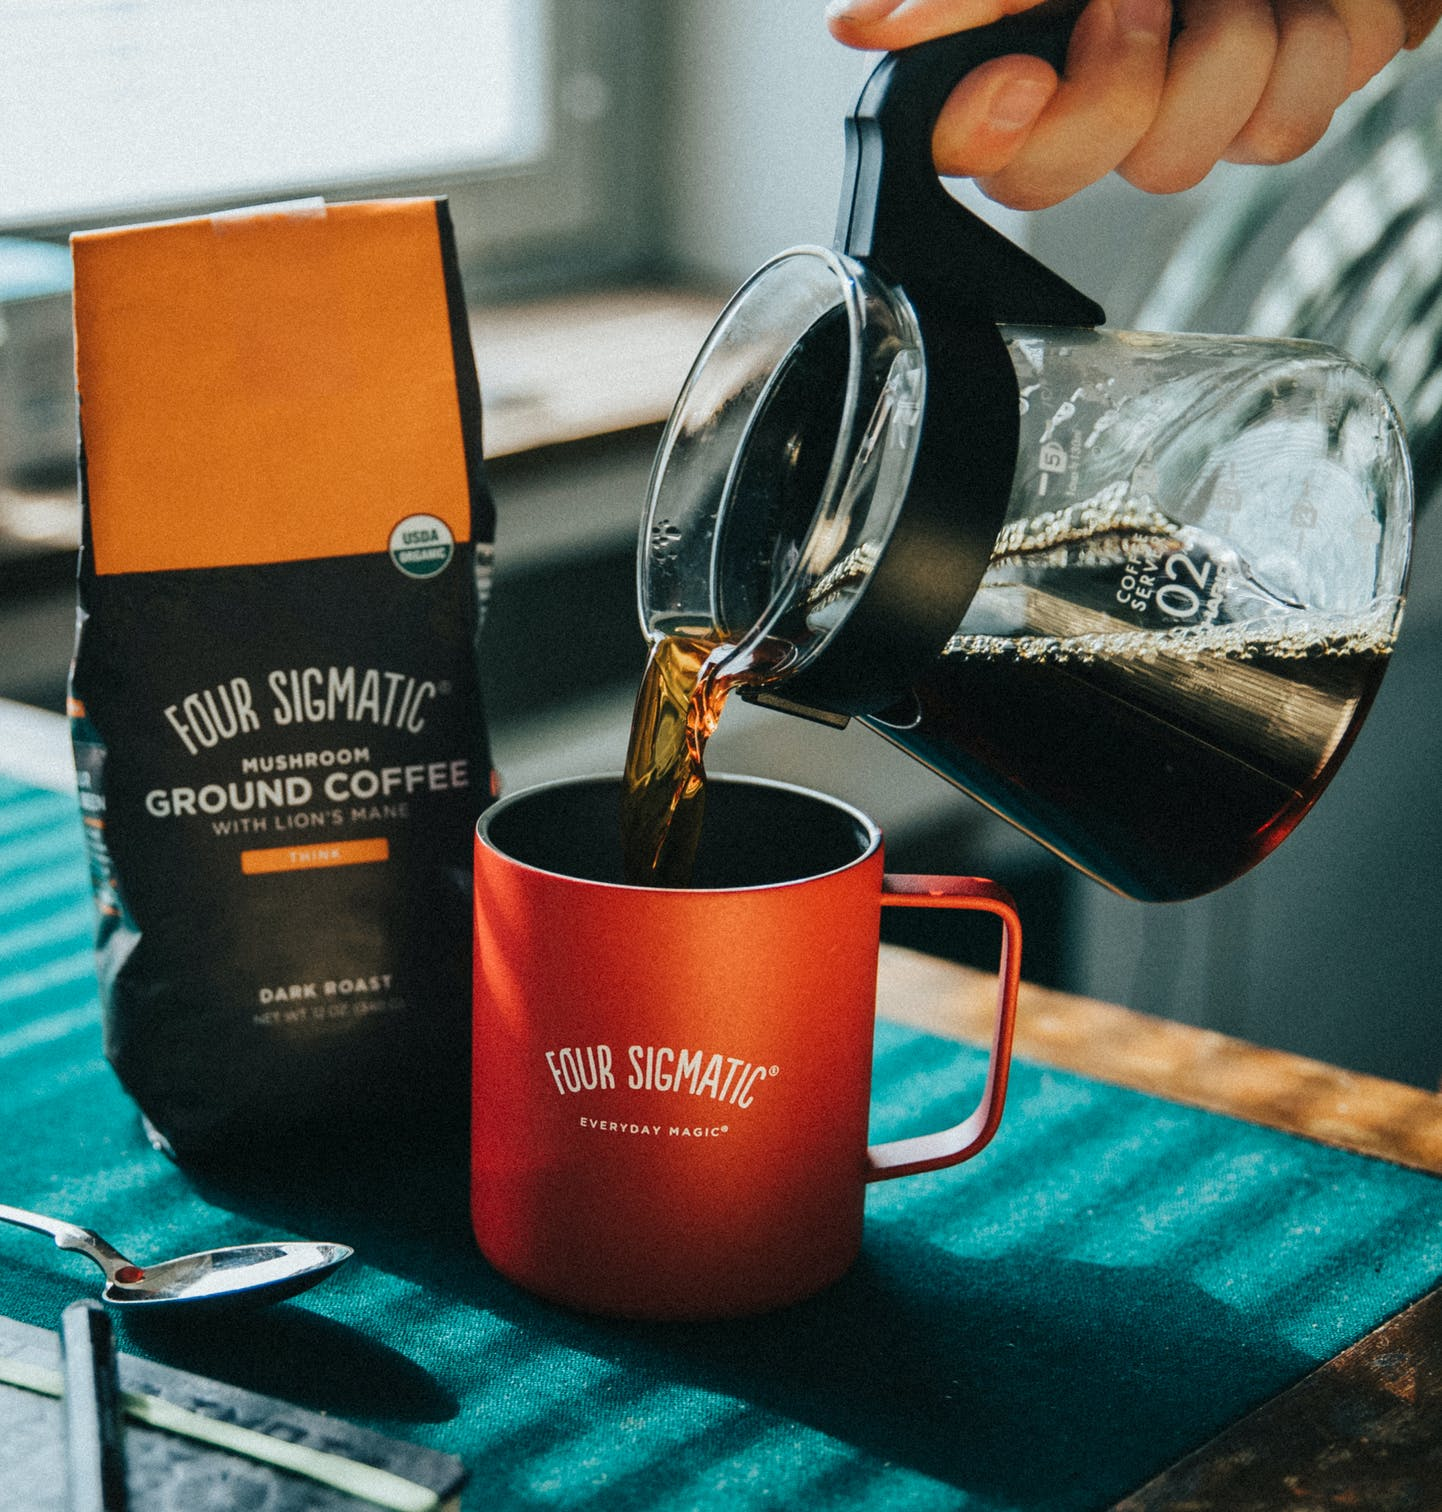 Ground coffee Lion's mane